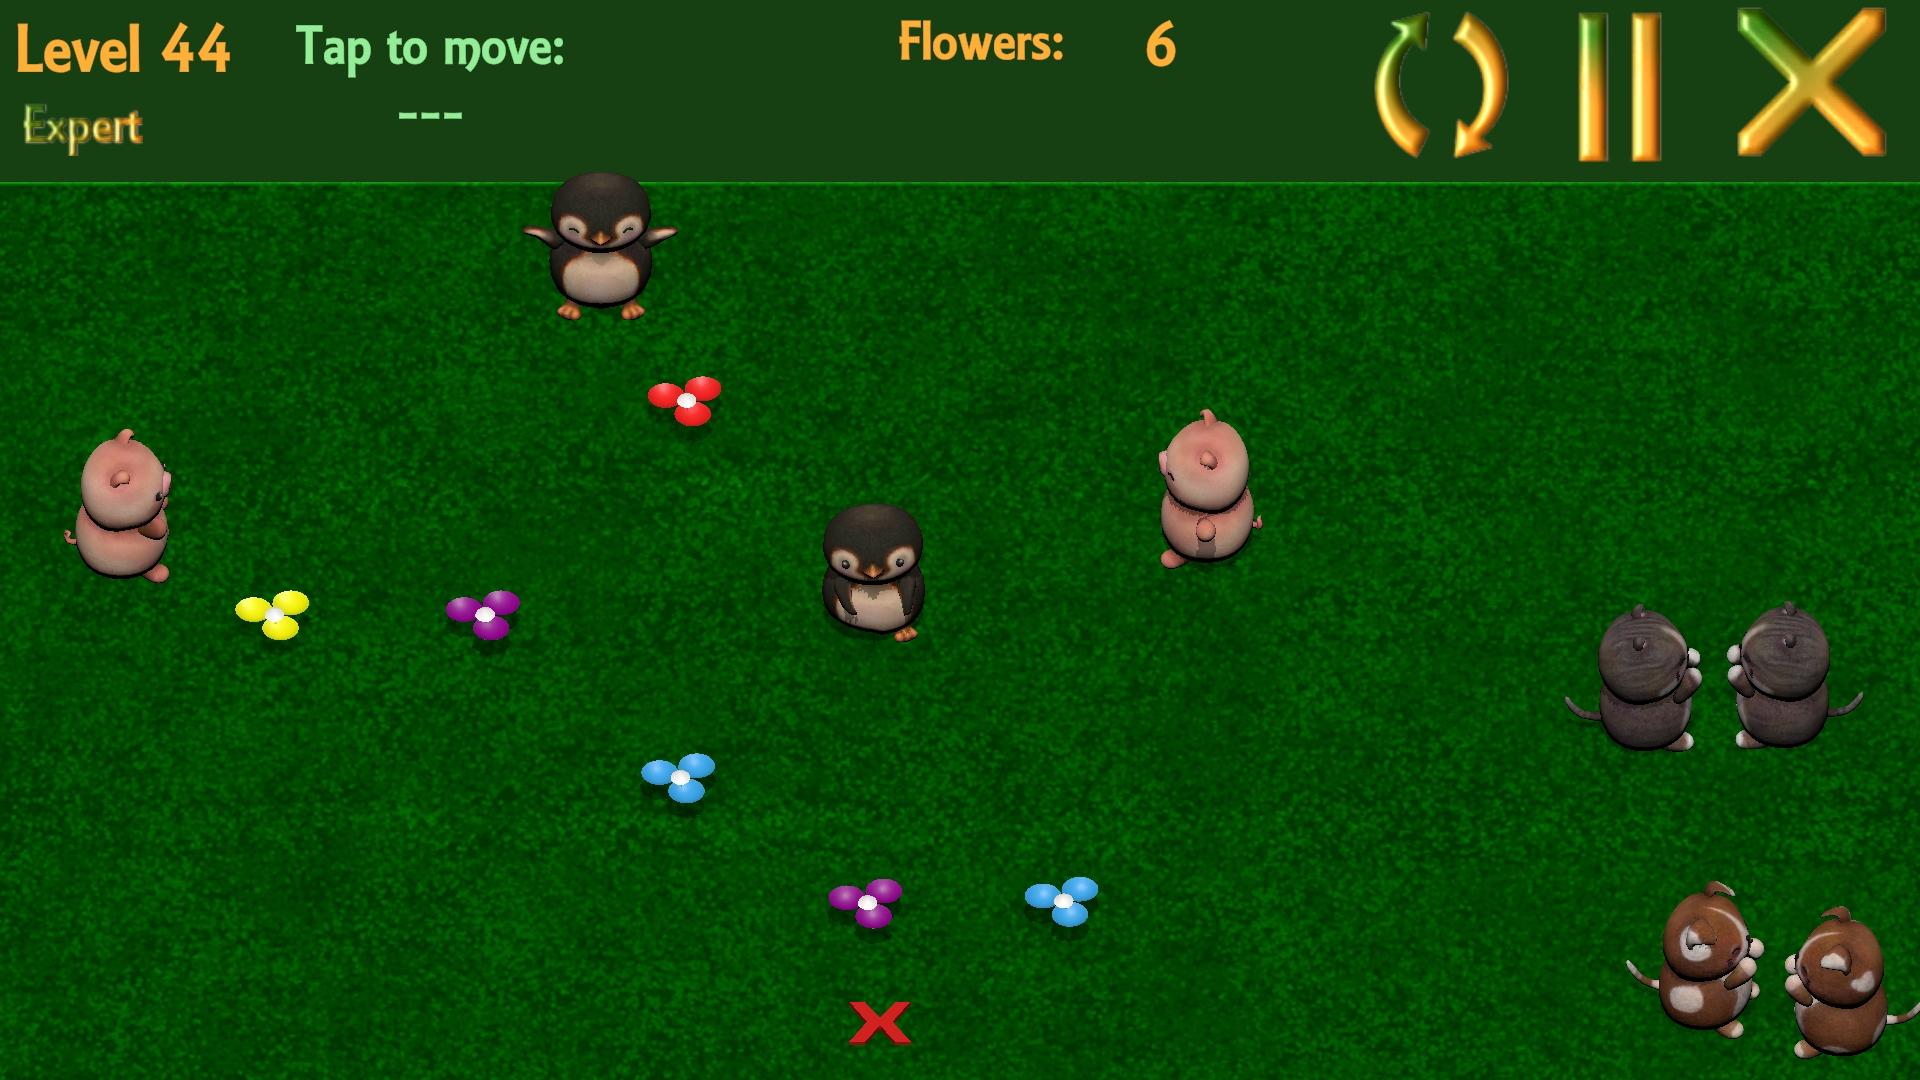 Screenshot 9: Playful Cuddly Companions